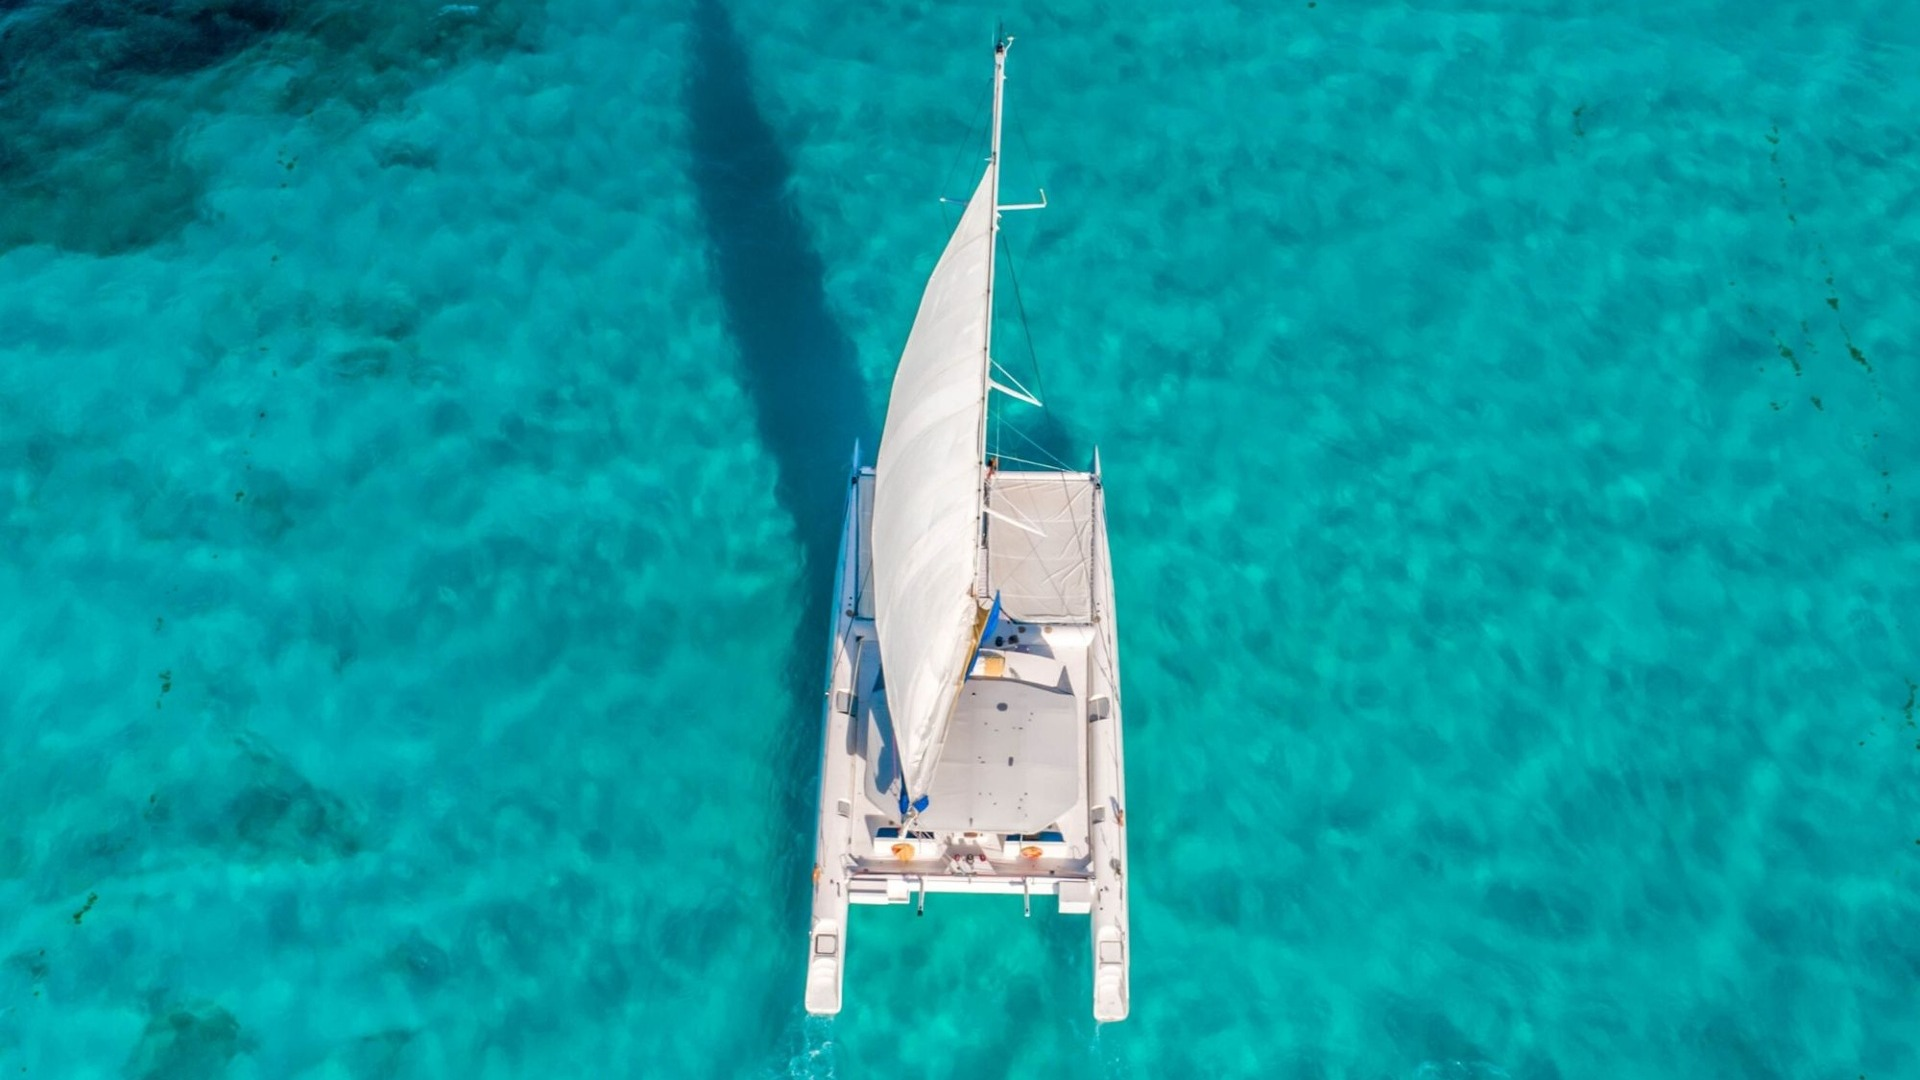 1 - LowRes - Sea Passion III - Isla Mujeres Catamaran Tour - Cancun Sailing